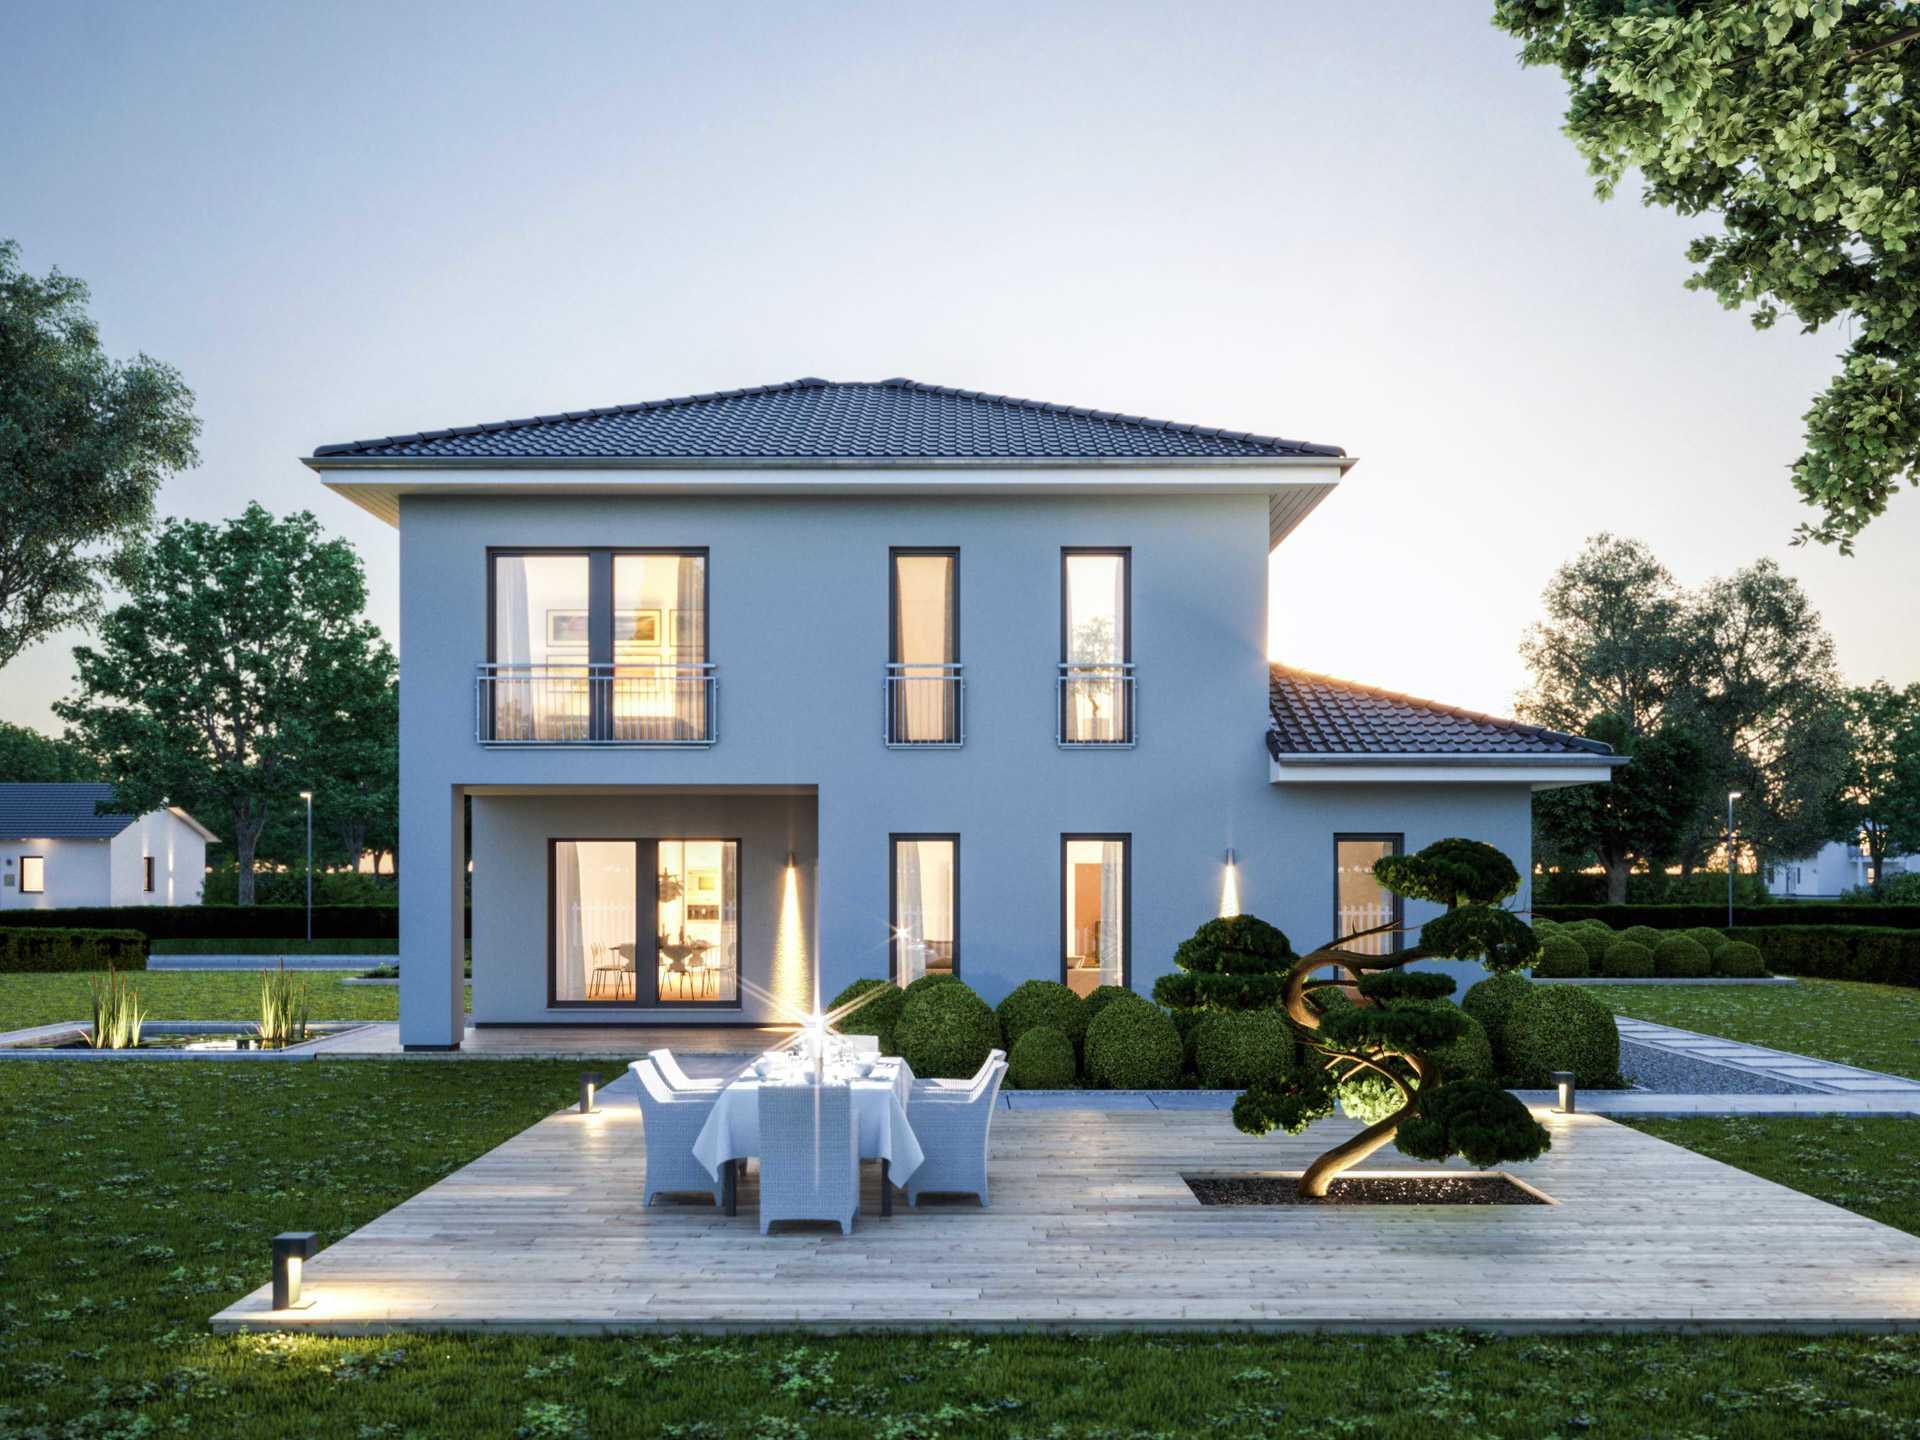 stadtvilla lifestyle w massa haus. Black Bedroom Furniture Sets. Home Design Ideas